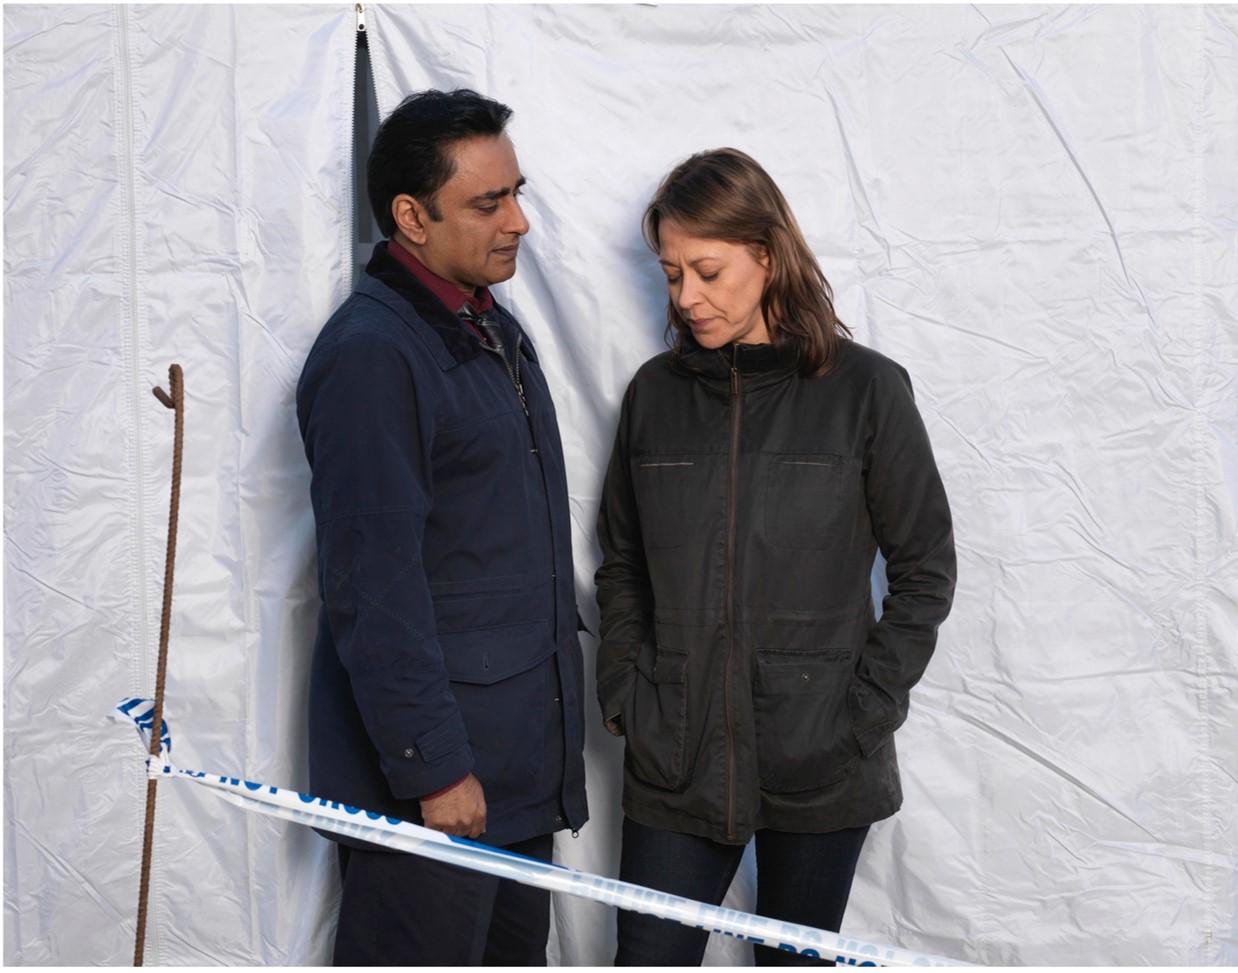 Nicola Walker and Sanjeev Bhaskar